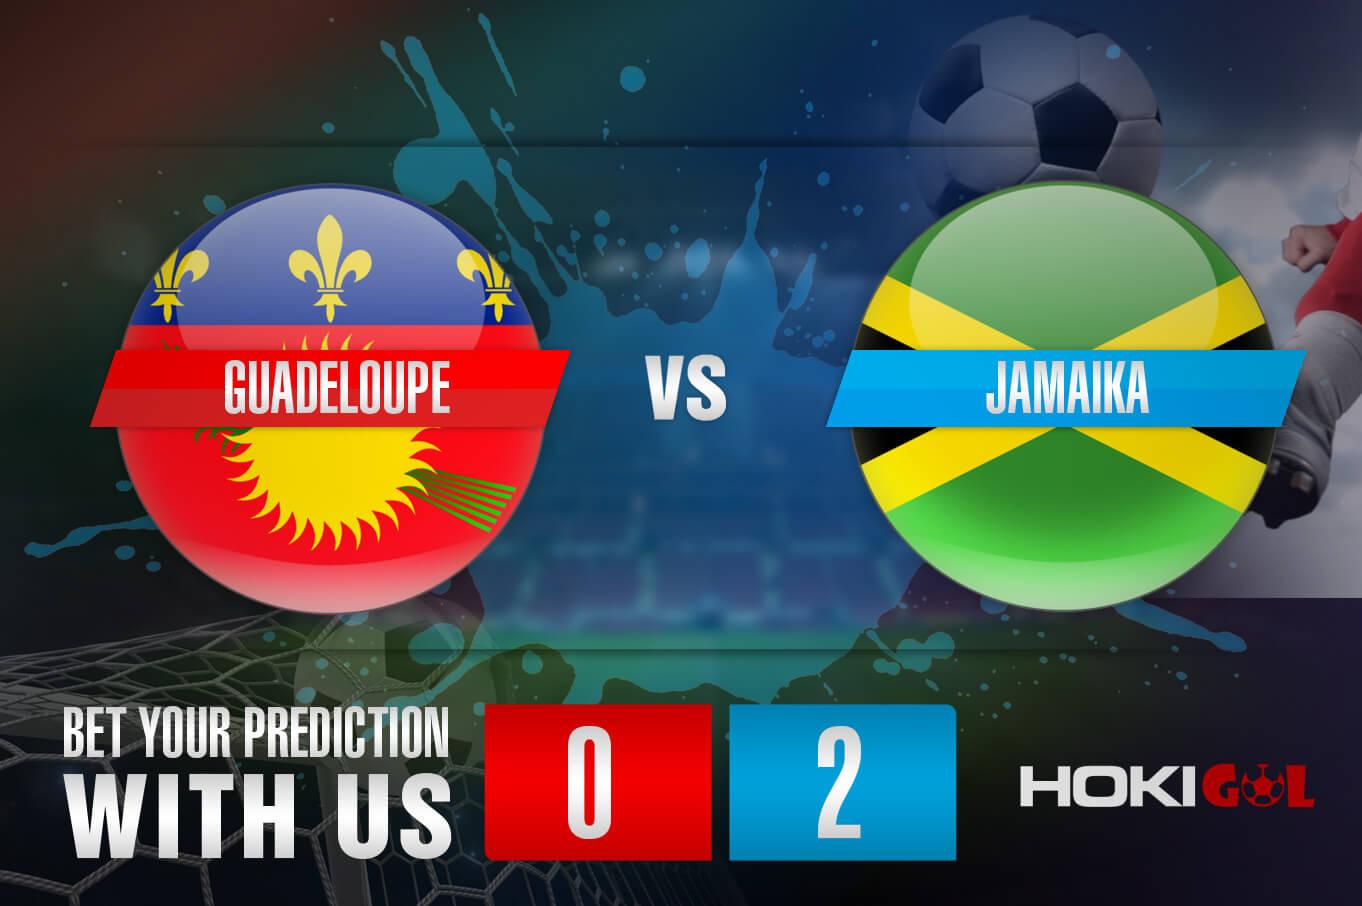 Prediksi Bola Guadeloupe Vs Jamaika 17 Juli 2021